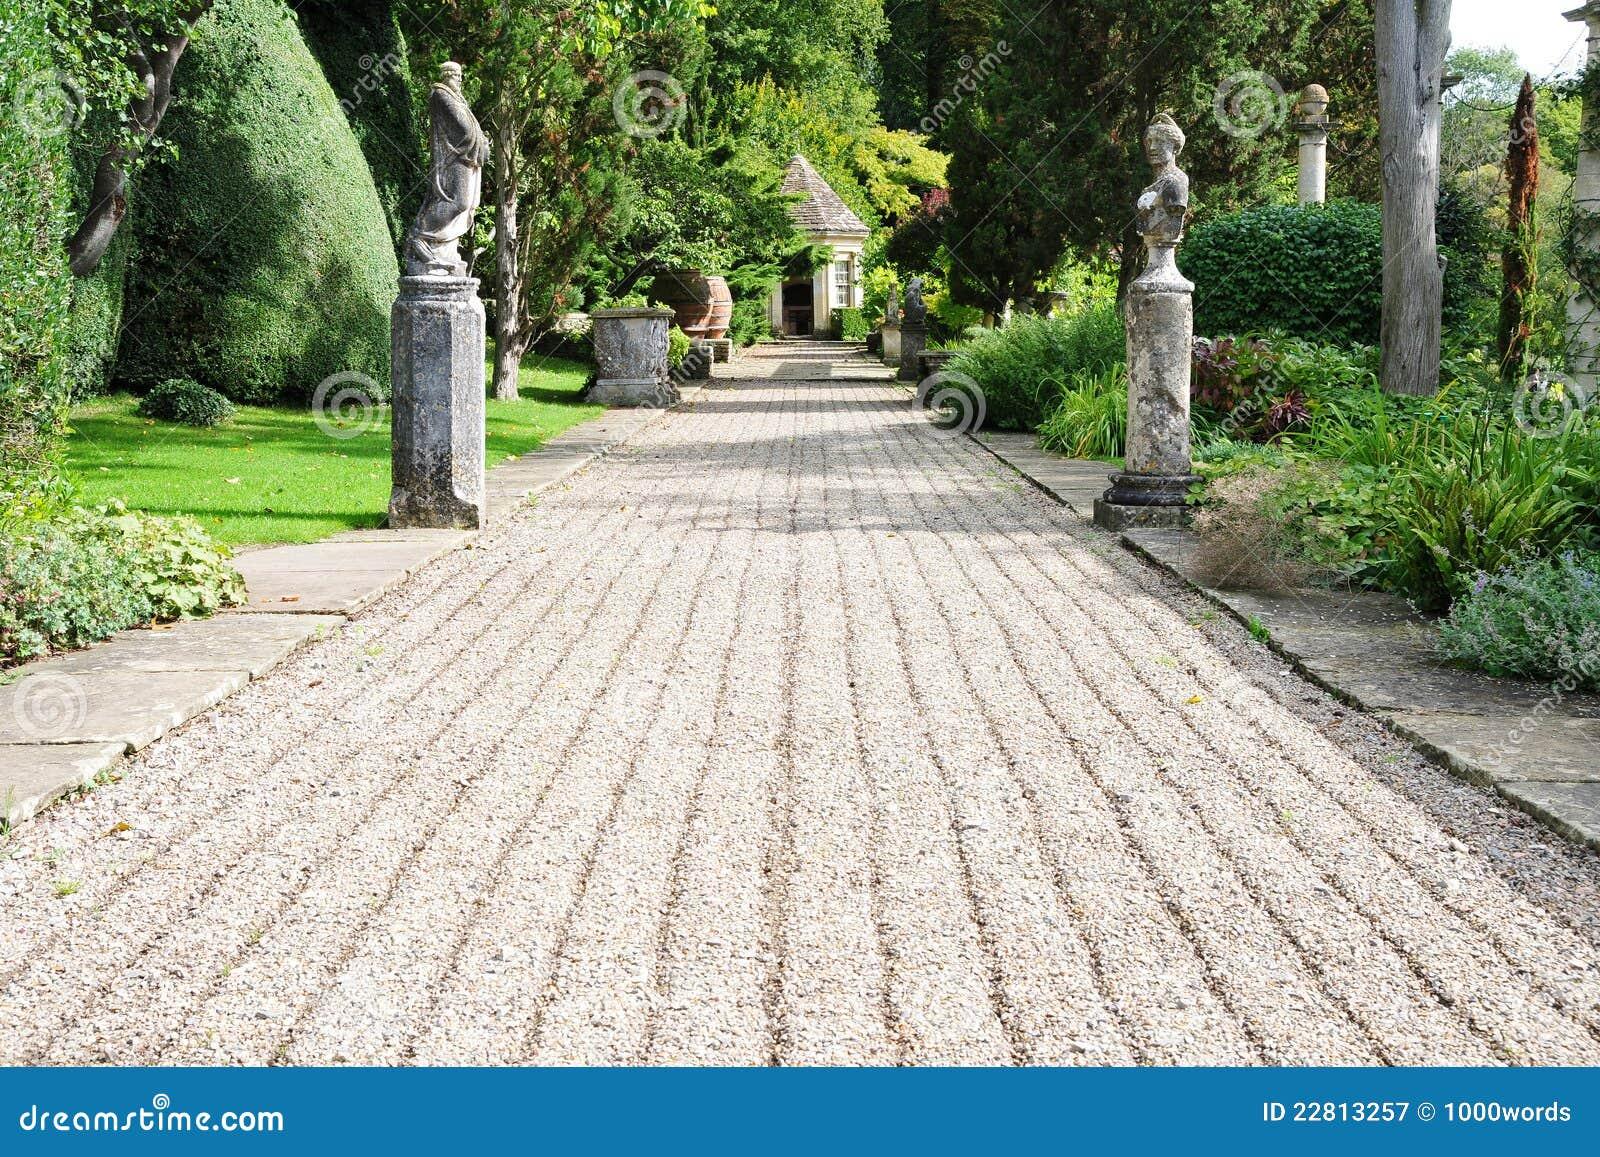 Trajeto em um jardim formal inglês